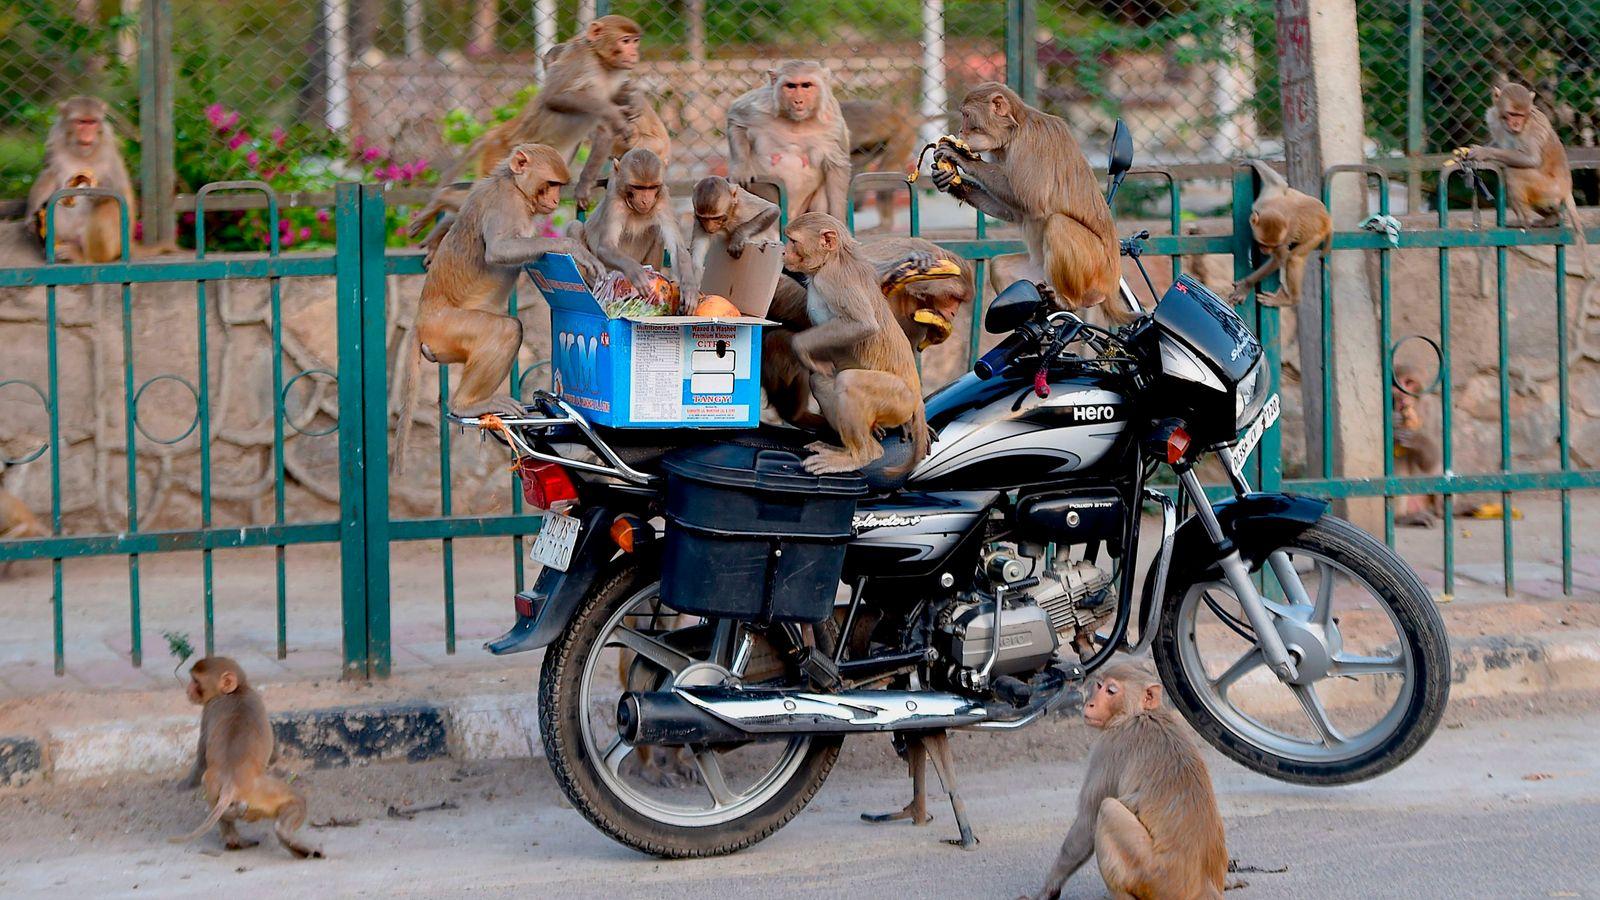 Monkeys COVID-19